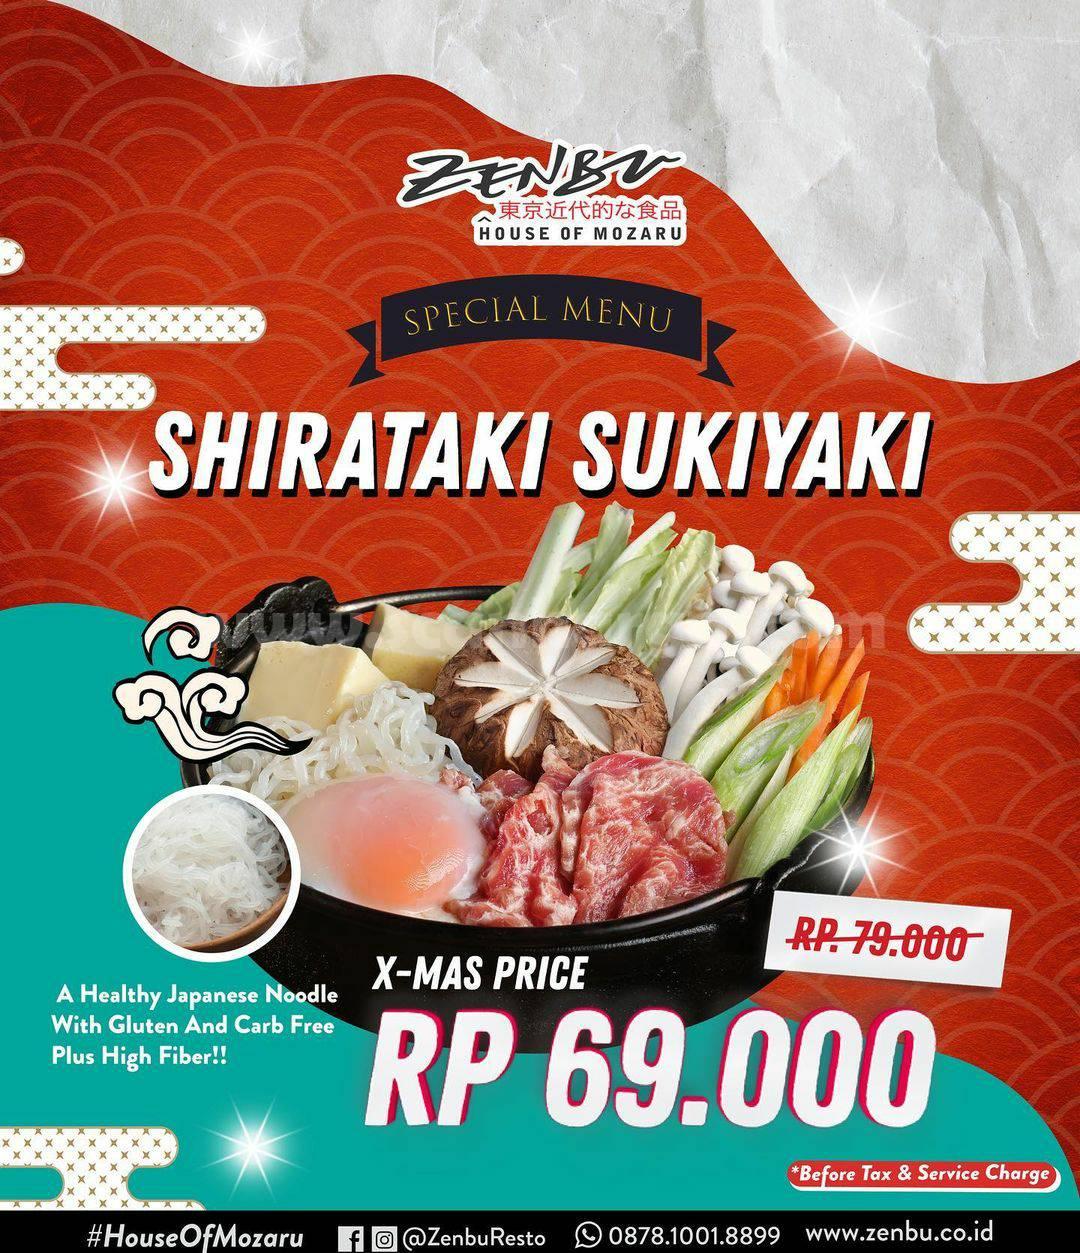 Promo Zenbu Resto X–Mas Edition Shirataki Sukiyaki Hanya Rp 69.000